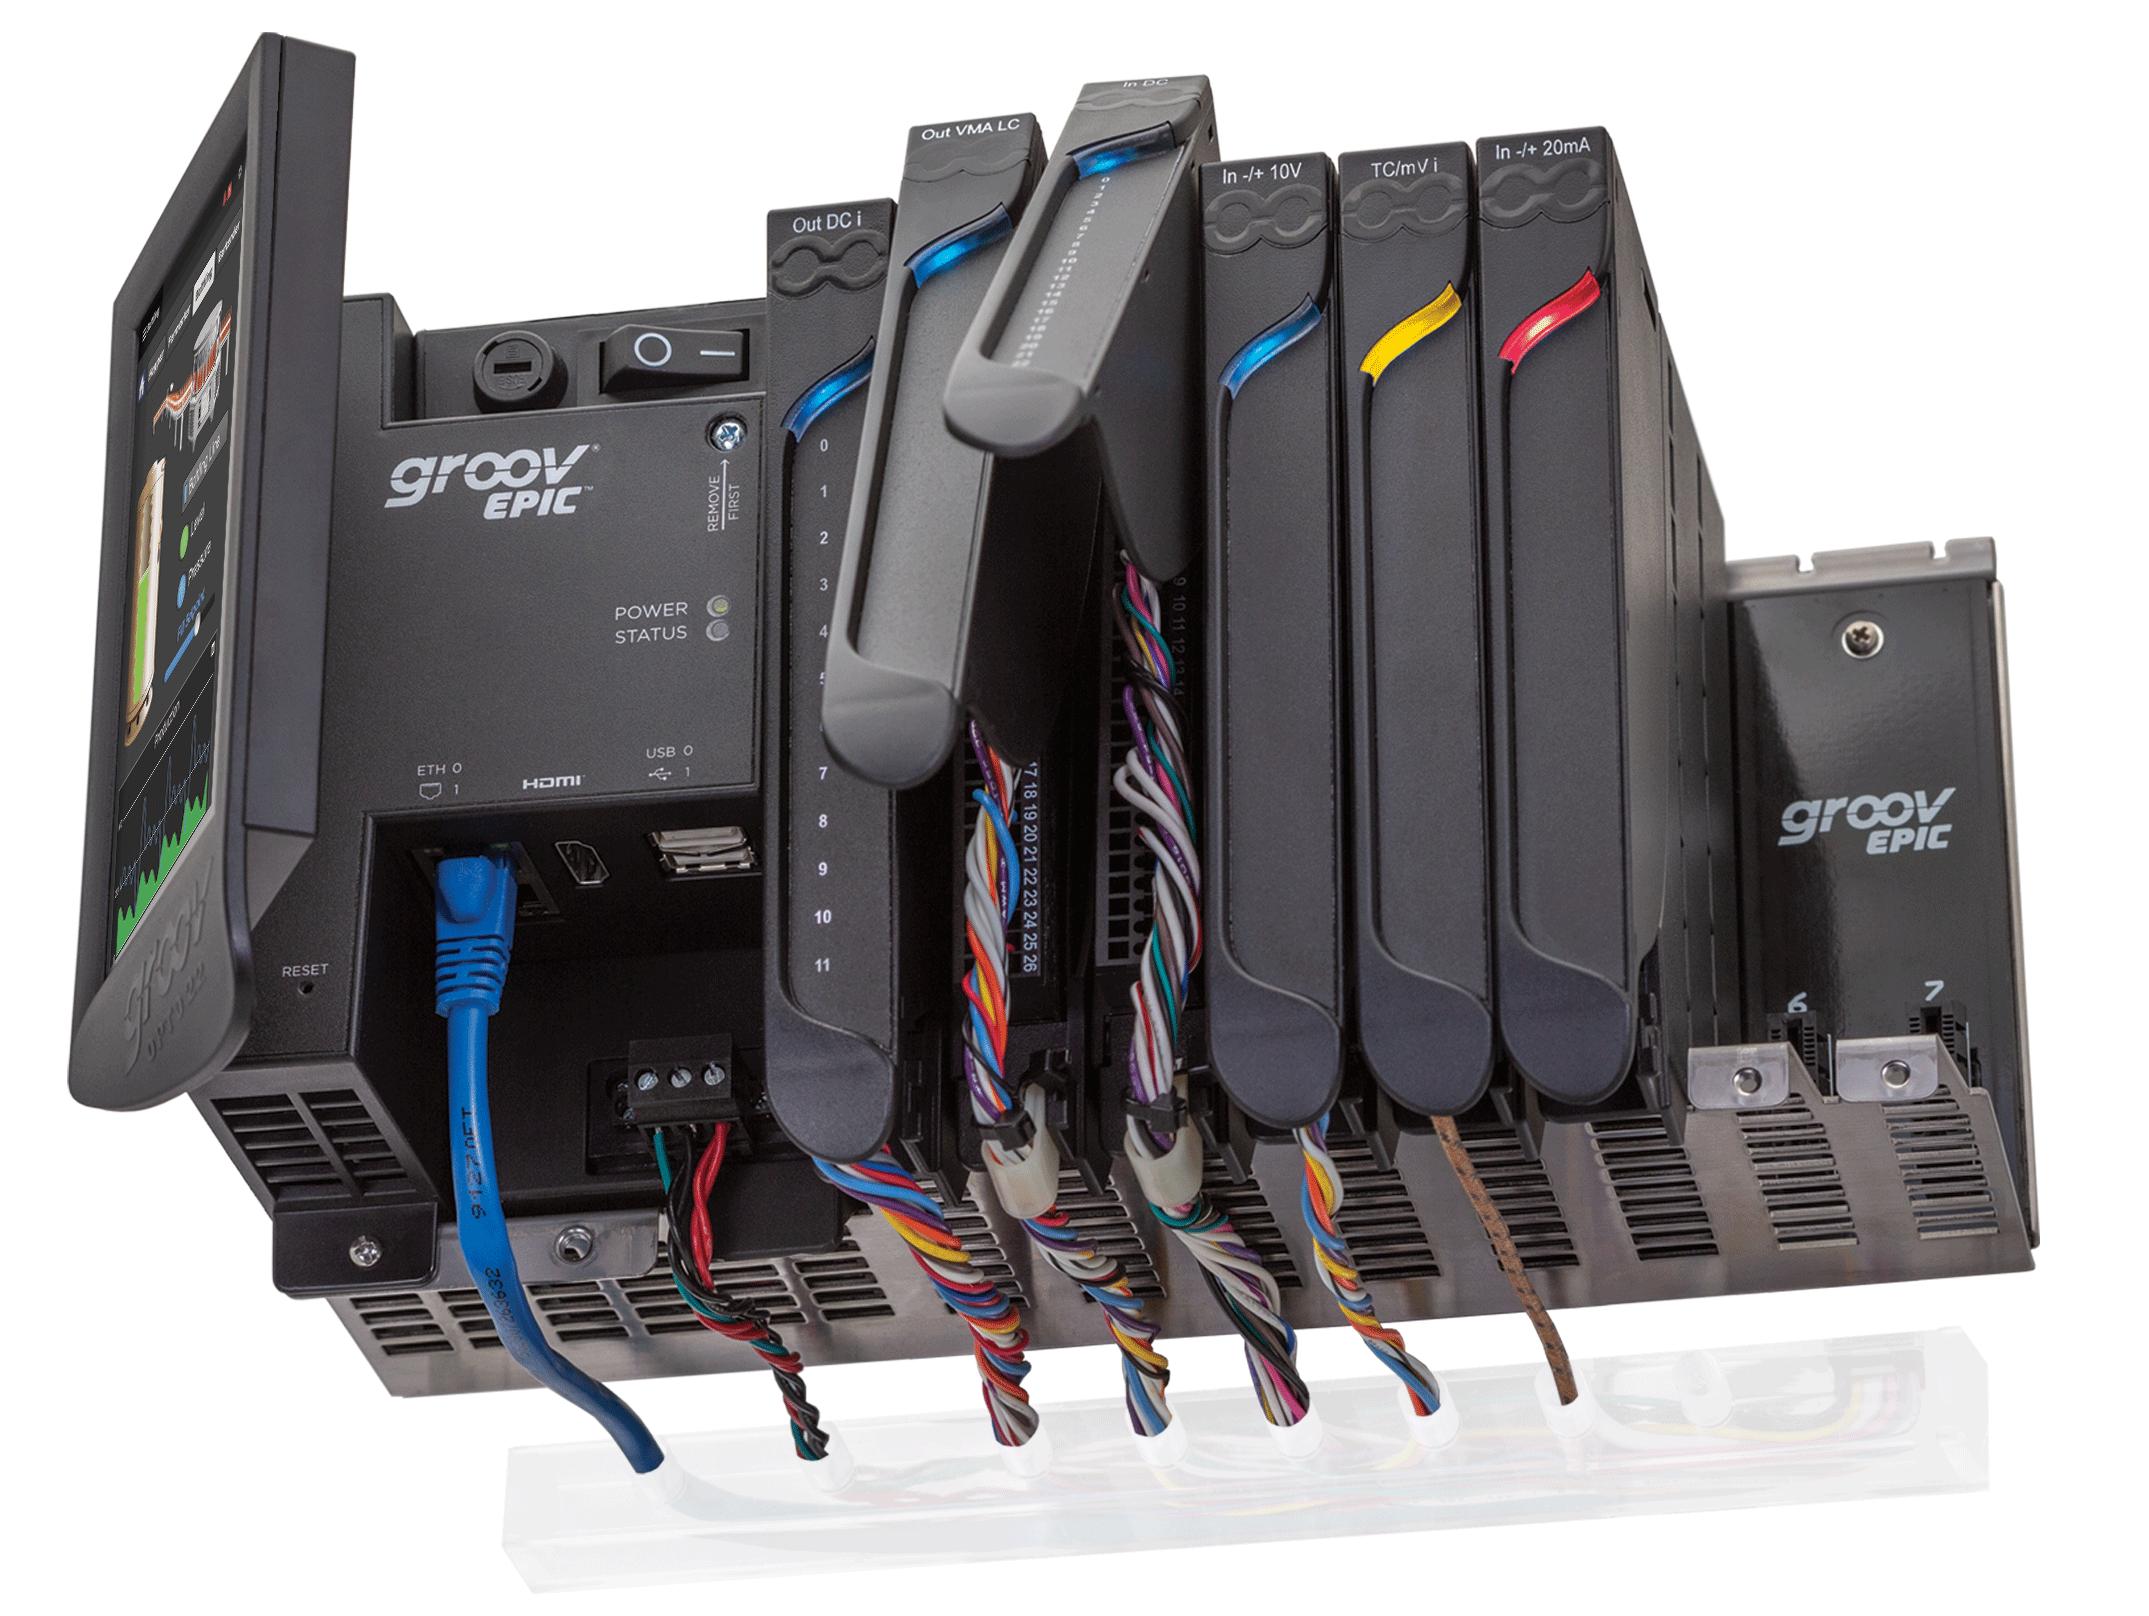 groov EPIC system